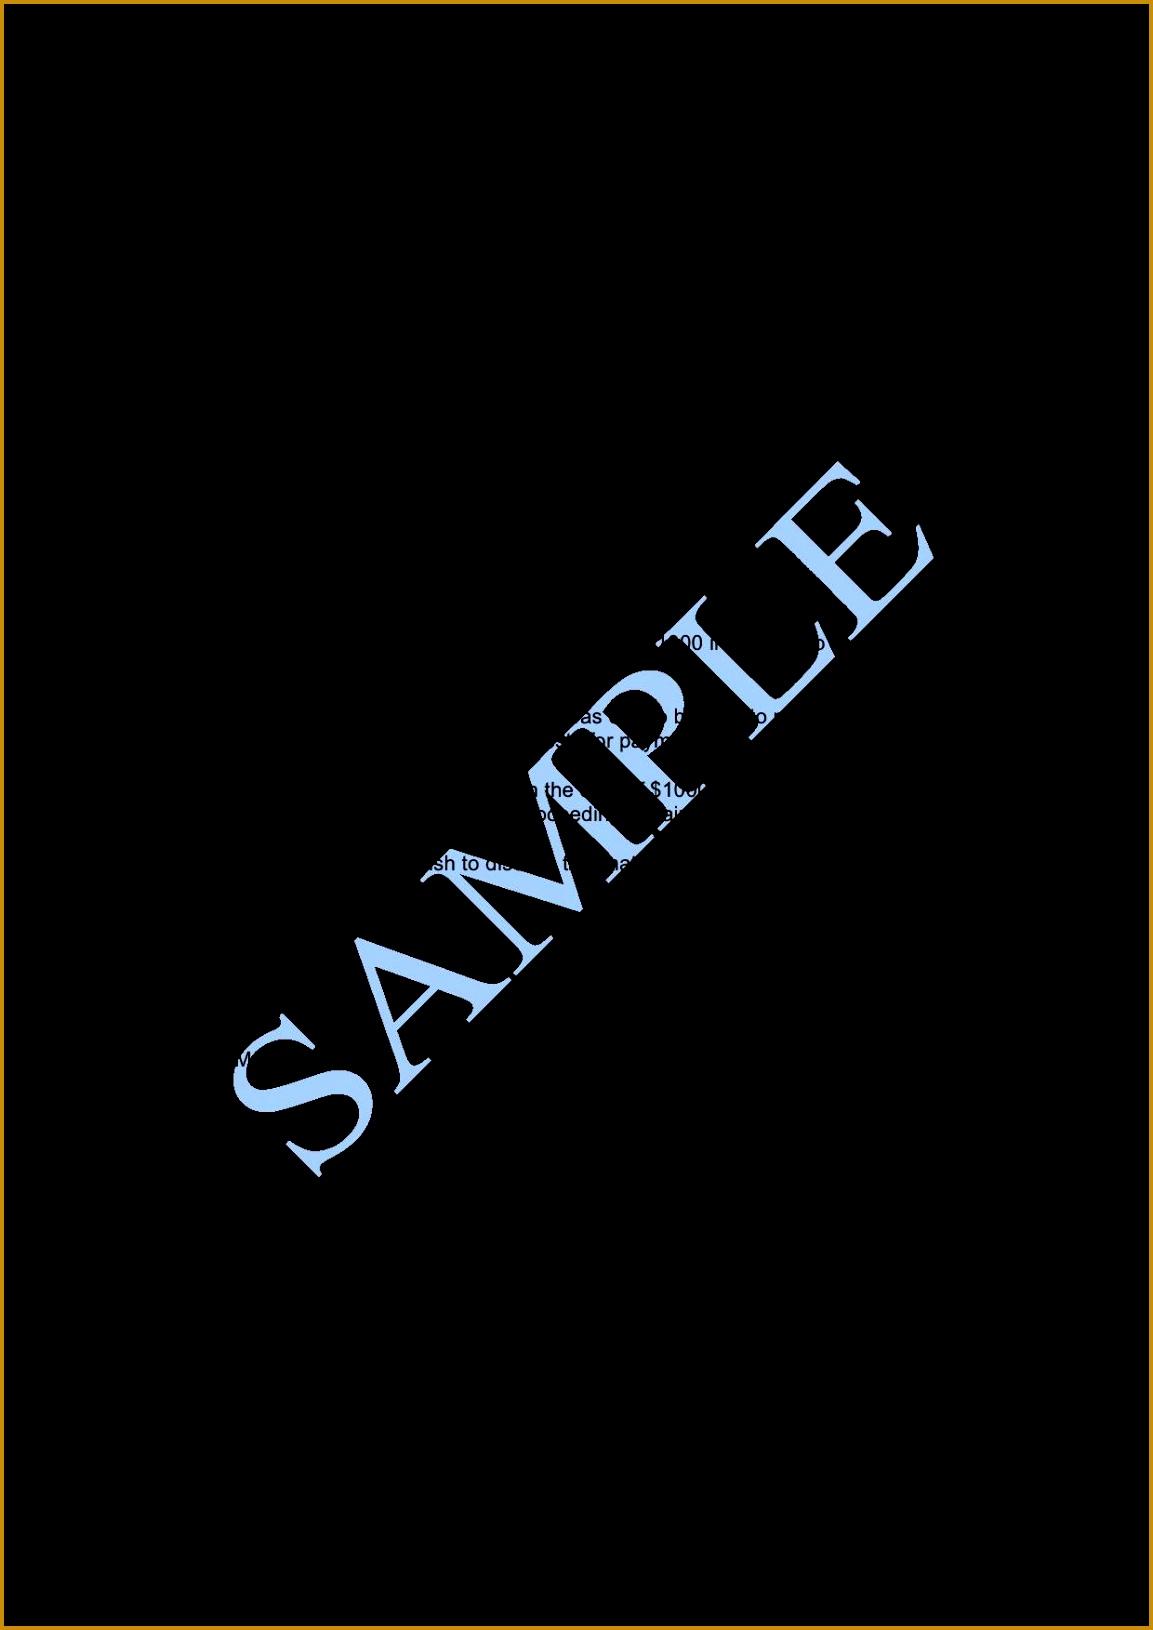 10 Unique Sample Cover Letter for line Teaching Position 16301153